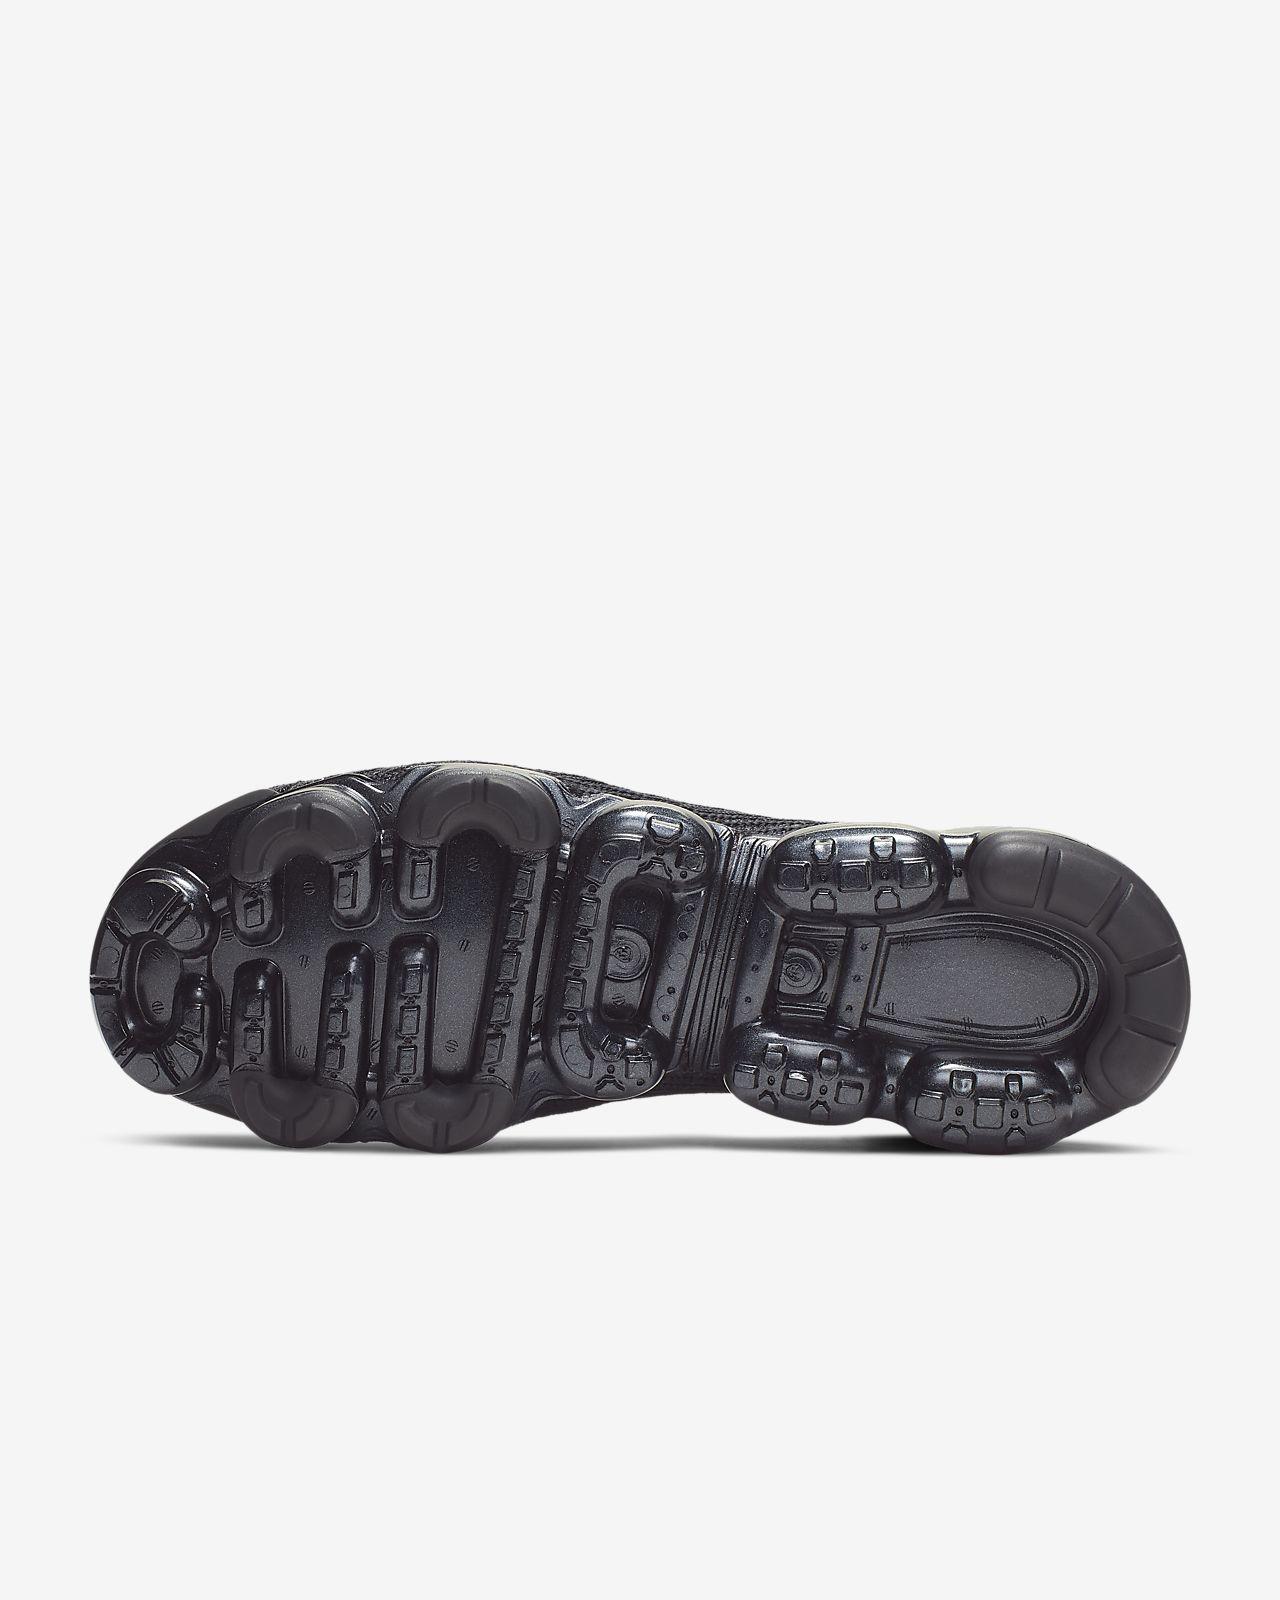 half off f6afa e7c46 ... Nike Air VaporMax Flyknit 3 Men s Shoe